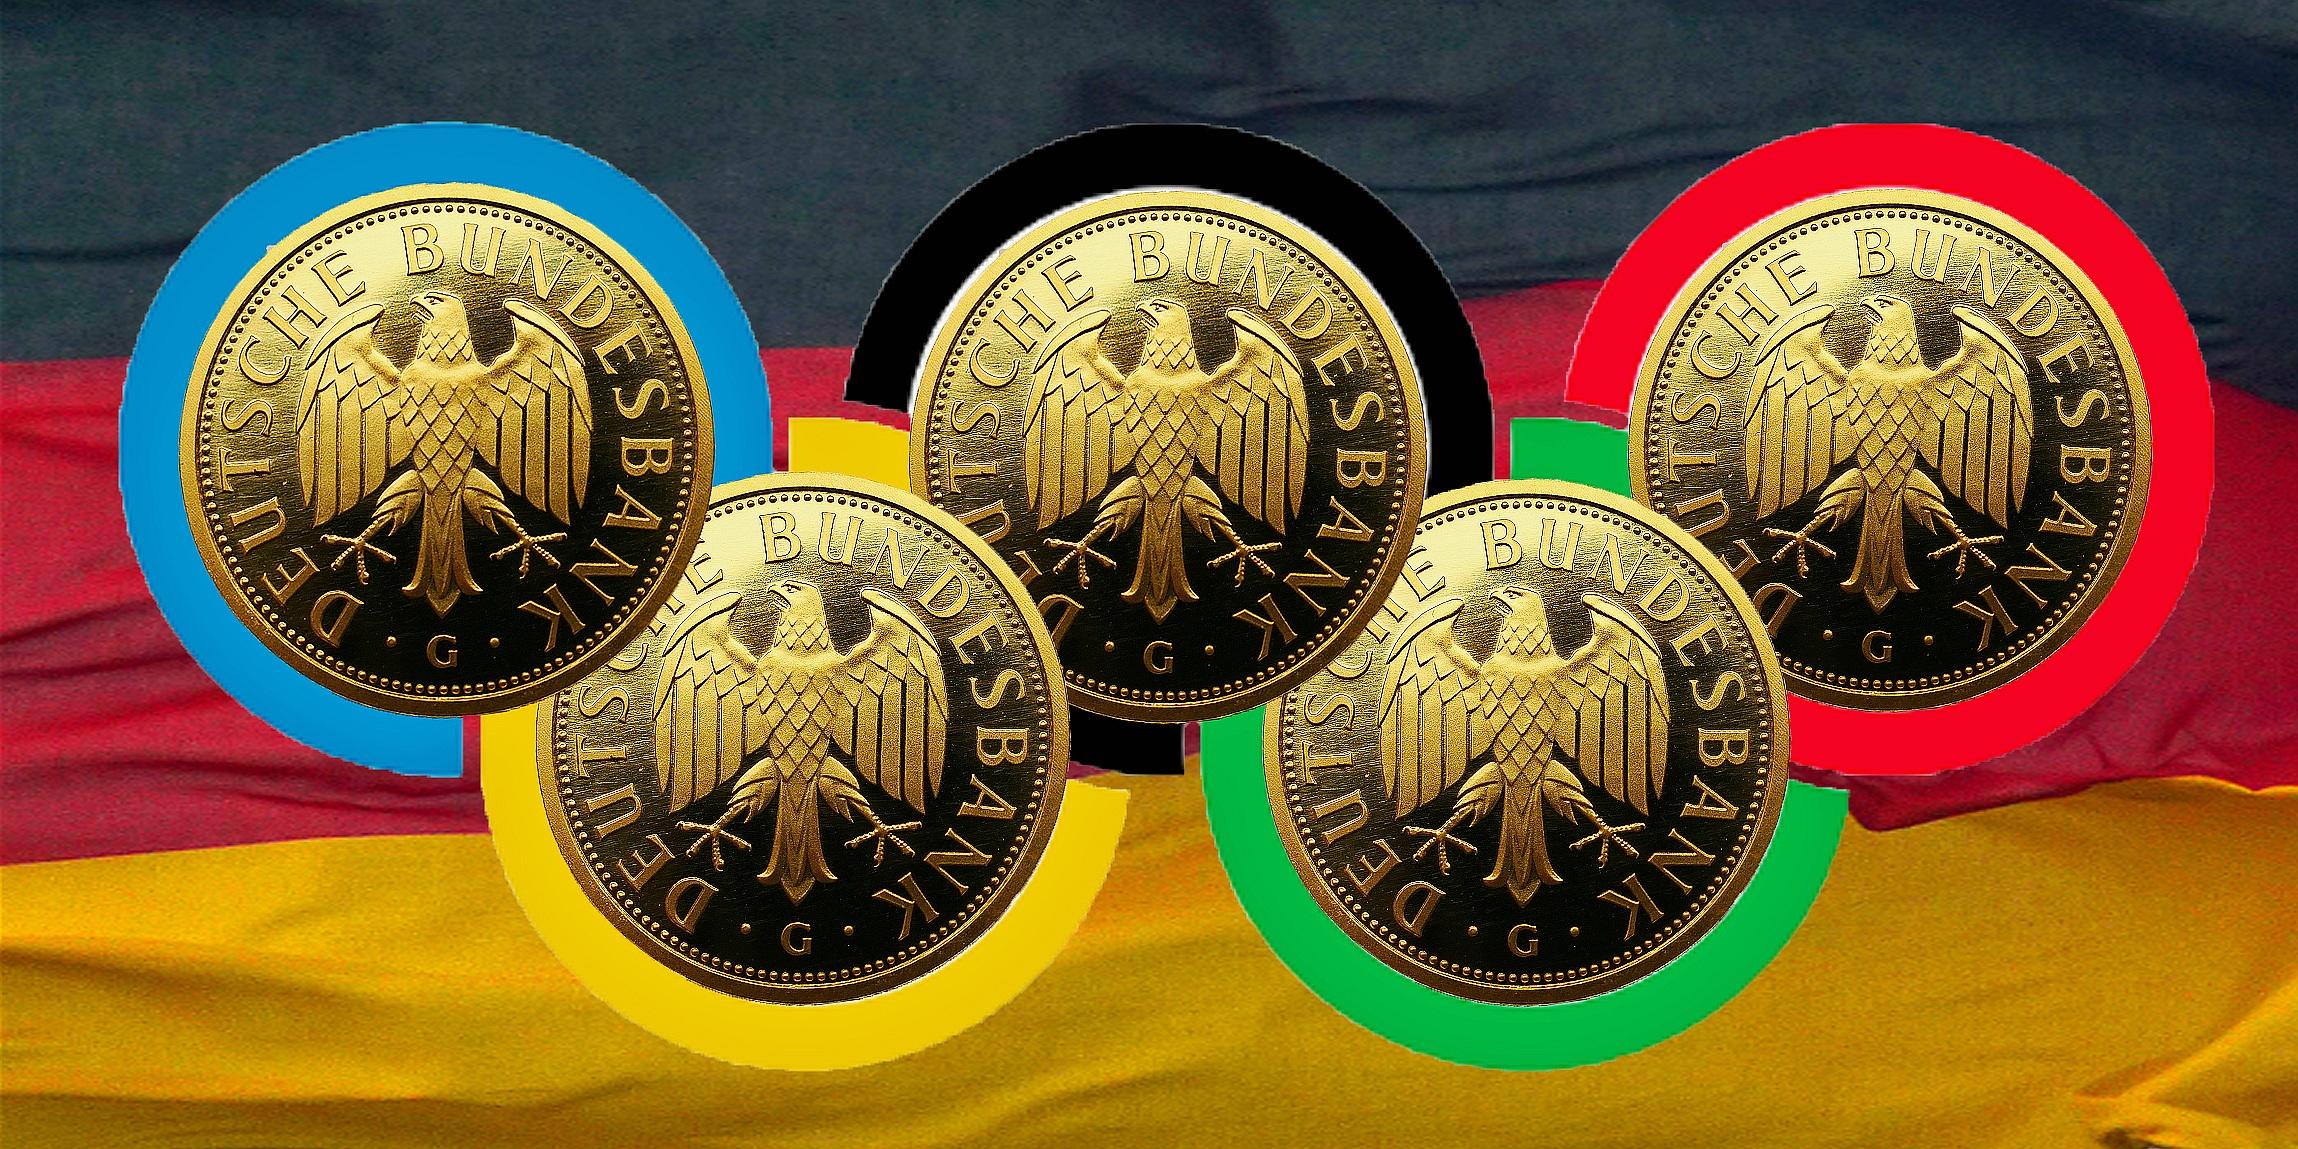 deutschland olympia